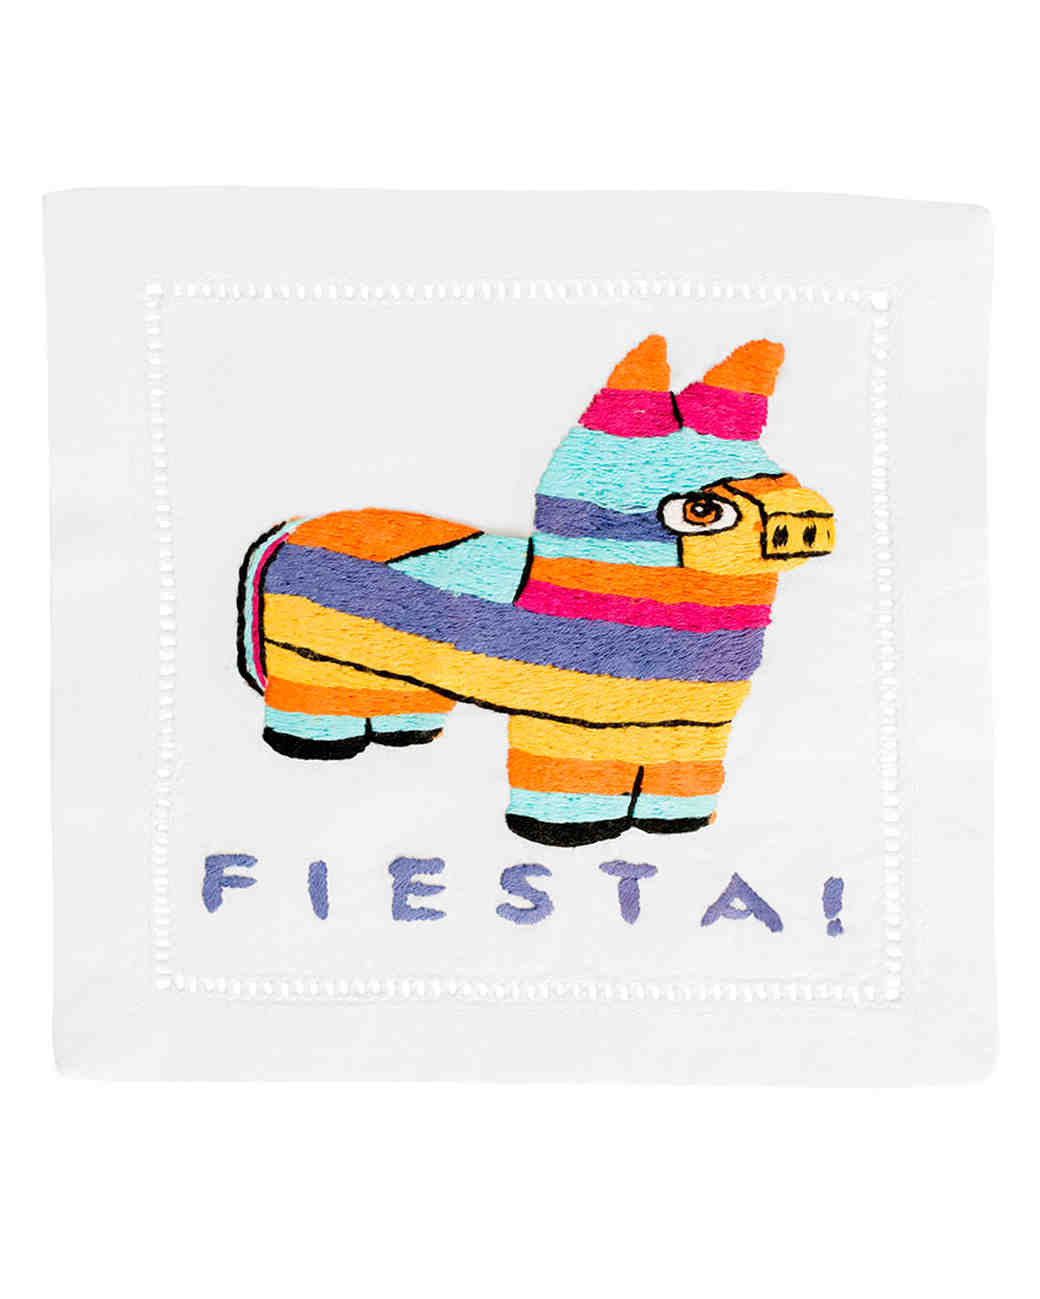 fiesta-cocktail-napkin-design-darling-1215.jpg